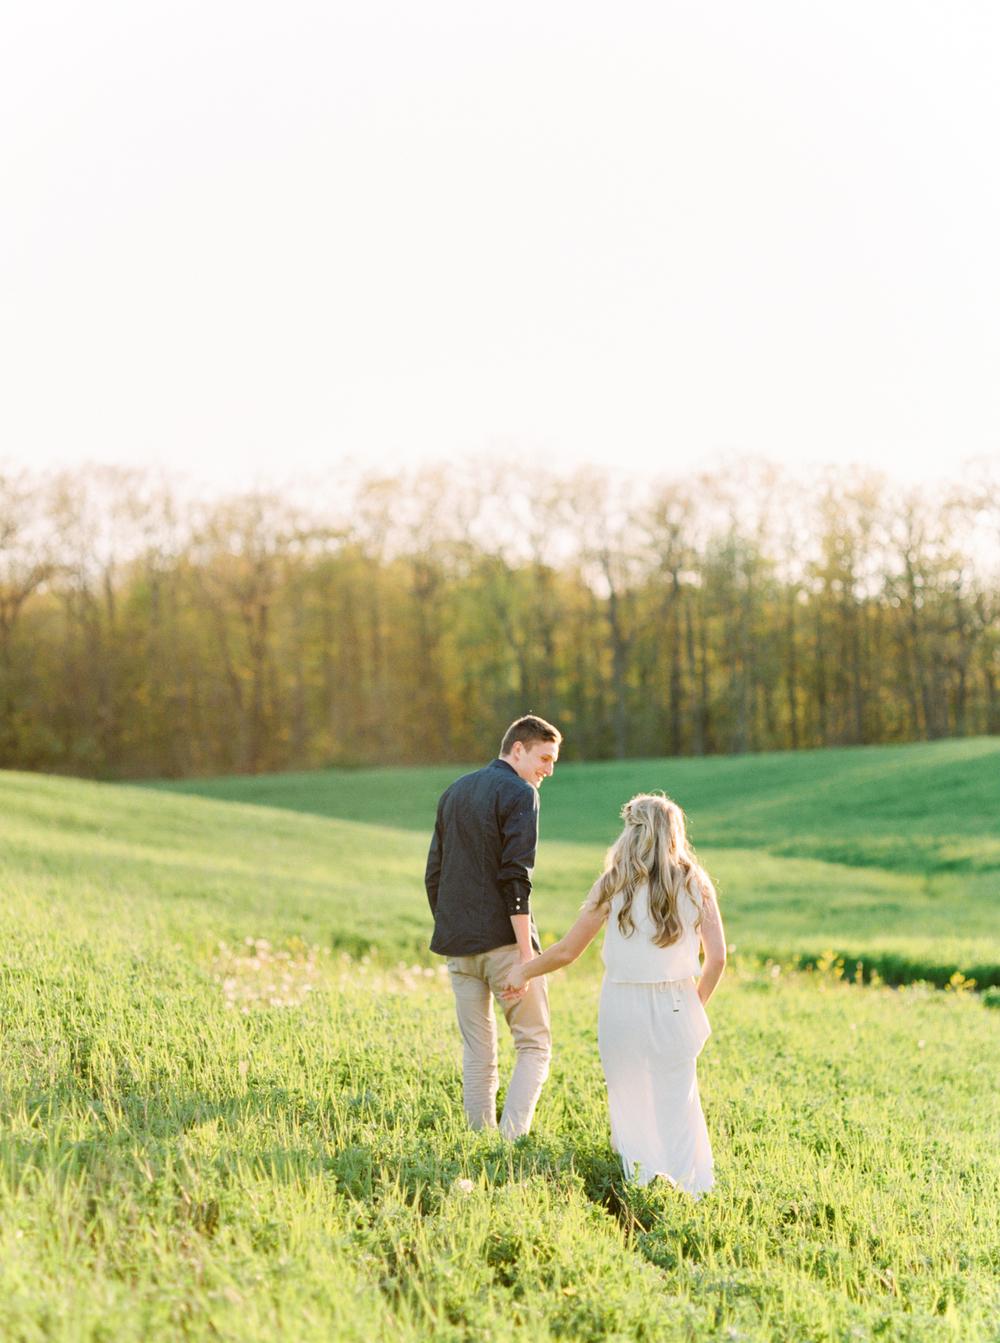 Katie-Nicolle-Niagara-Toronto-Muskoka-Wedding-1.jpg